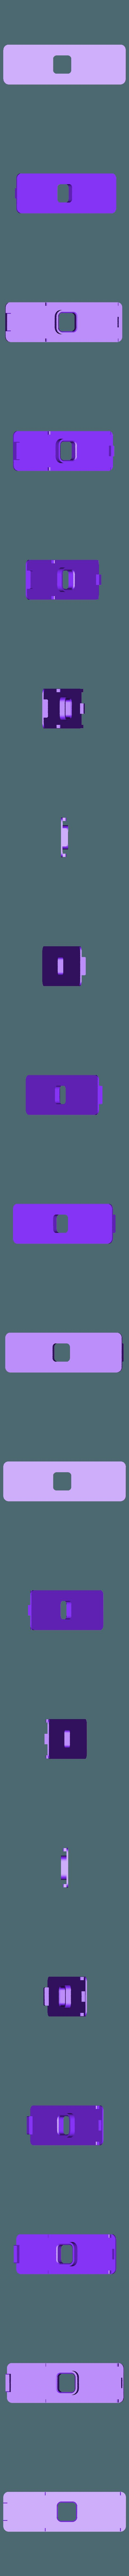 VA_Meter_Case_v2-1_REVERSE_BOTTOM.STL Download free STL file Voltmeter/Ammeter Case - 3 • 3D printer object, WalterHsiao